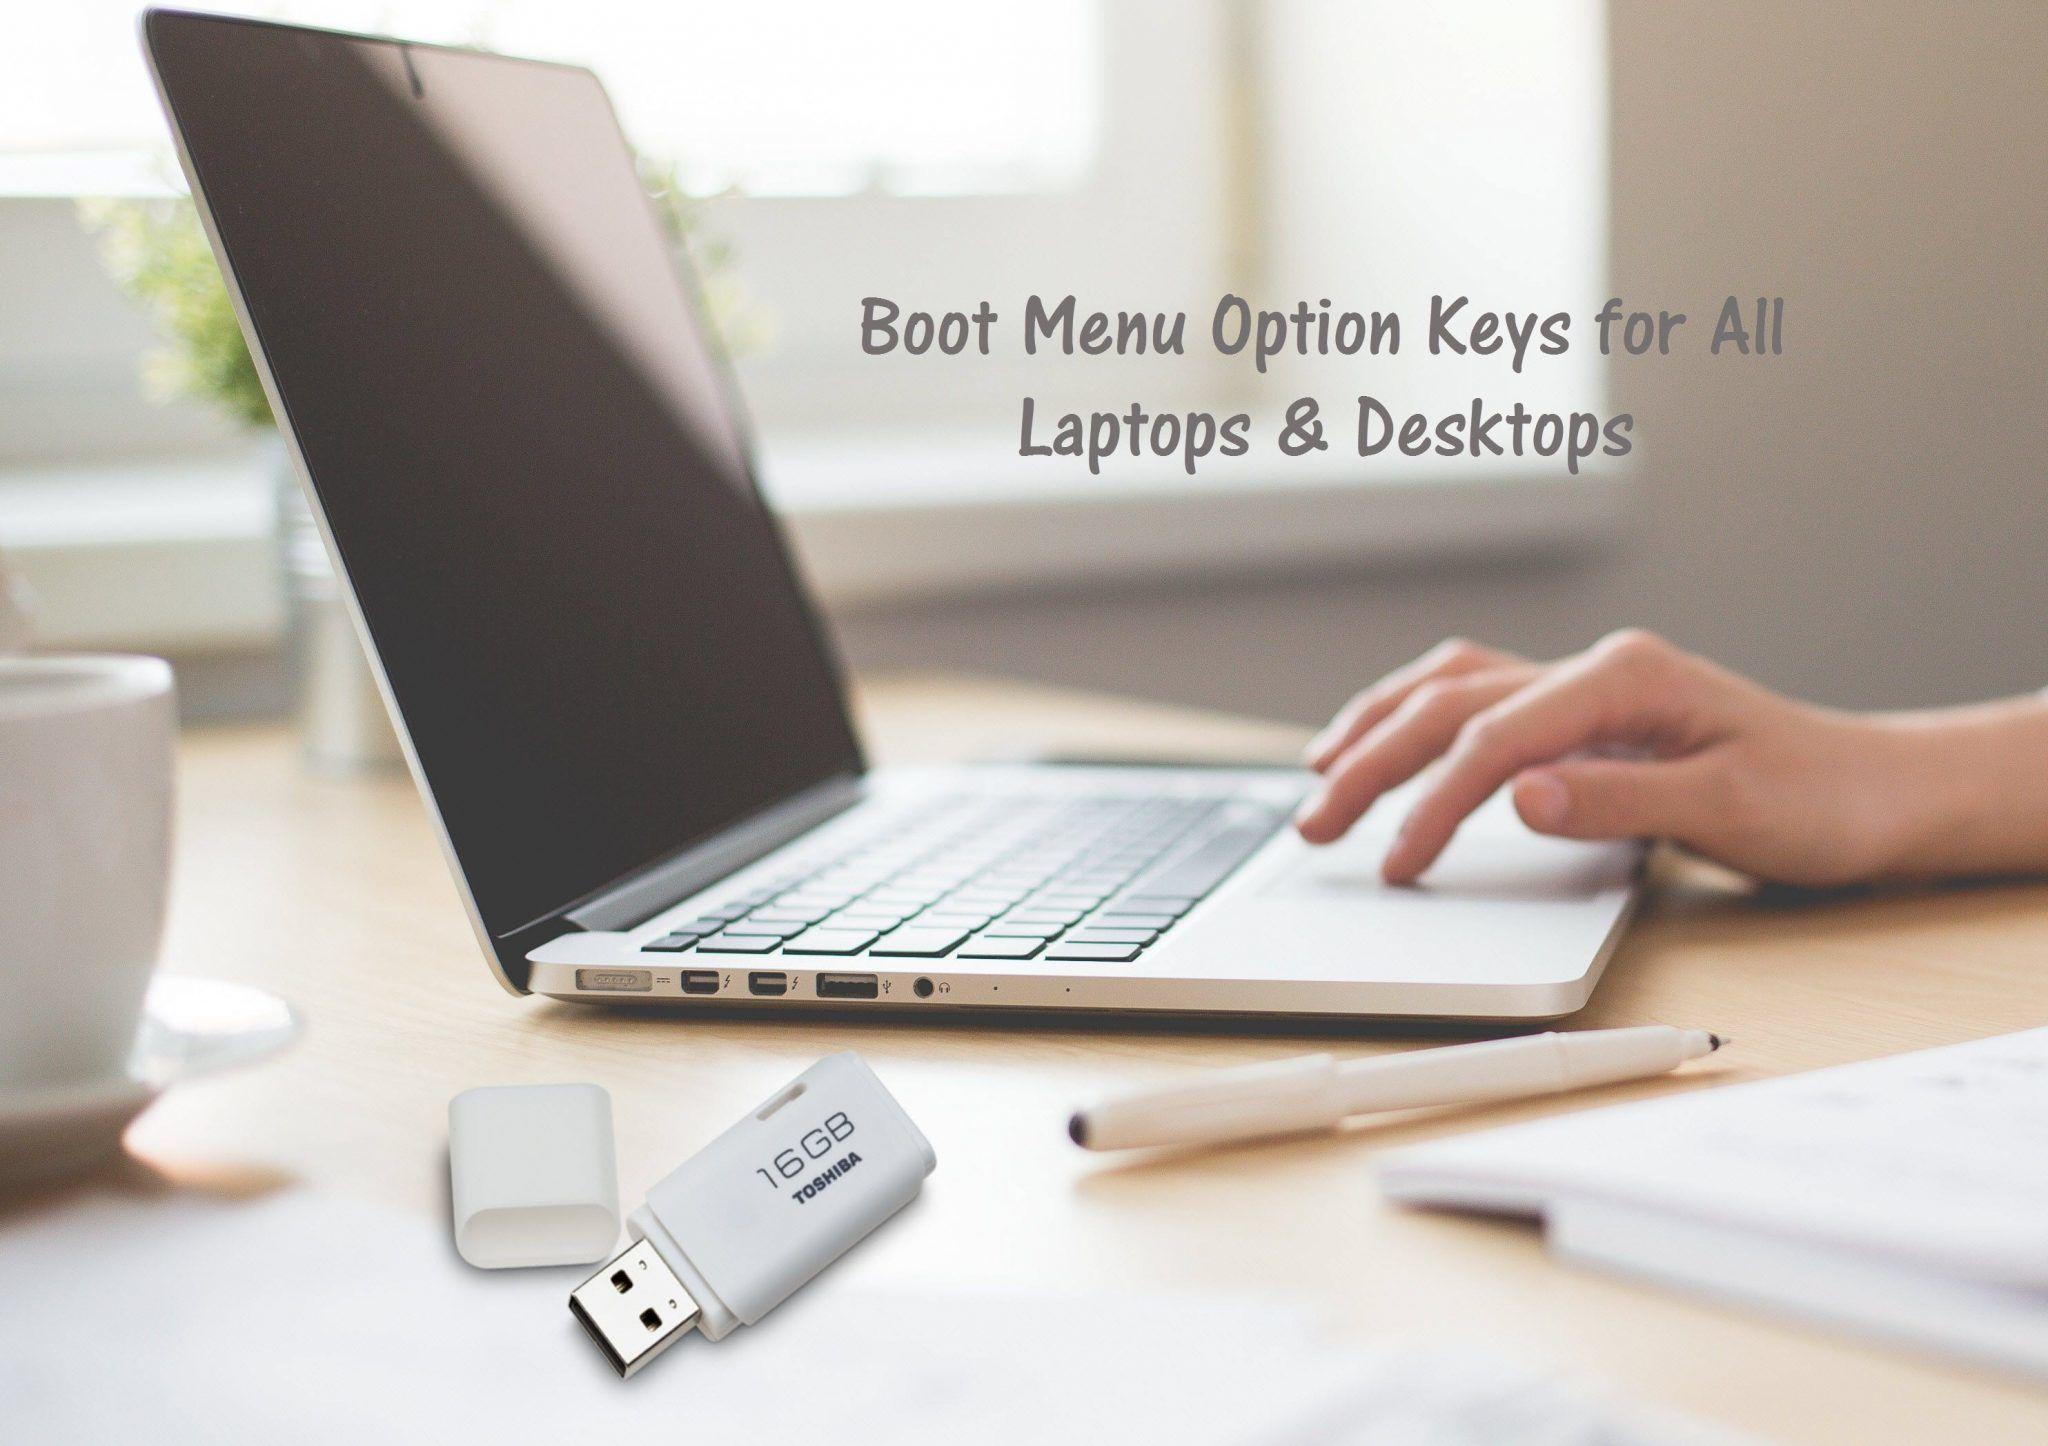 Boot Menu Option Keys for all Laptops & Desktops - System BIOS Keys